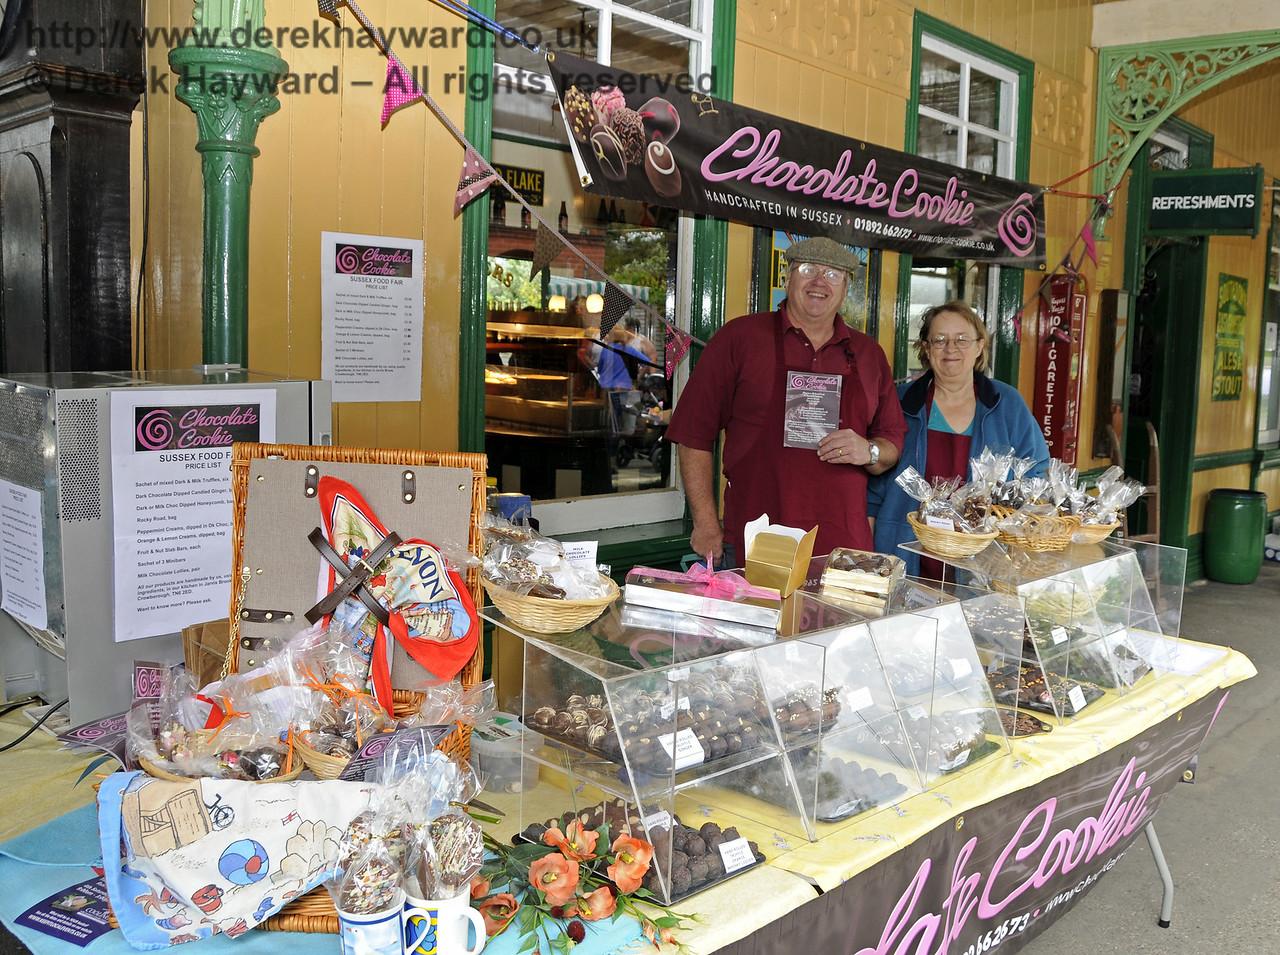 Chocolate Cookie.  Sussex Food Festival, Horsted Keynes, 05.07.2014  10980